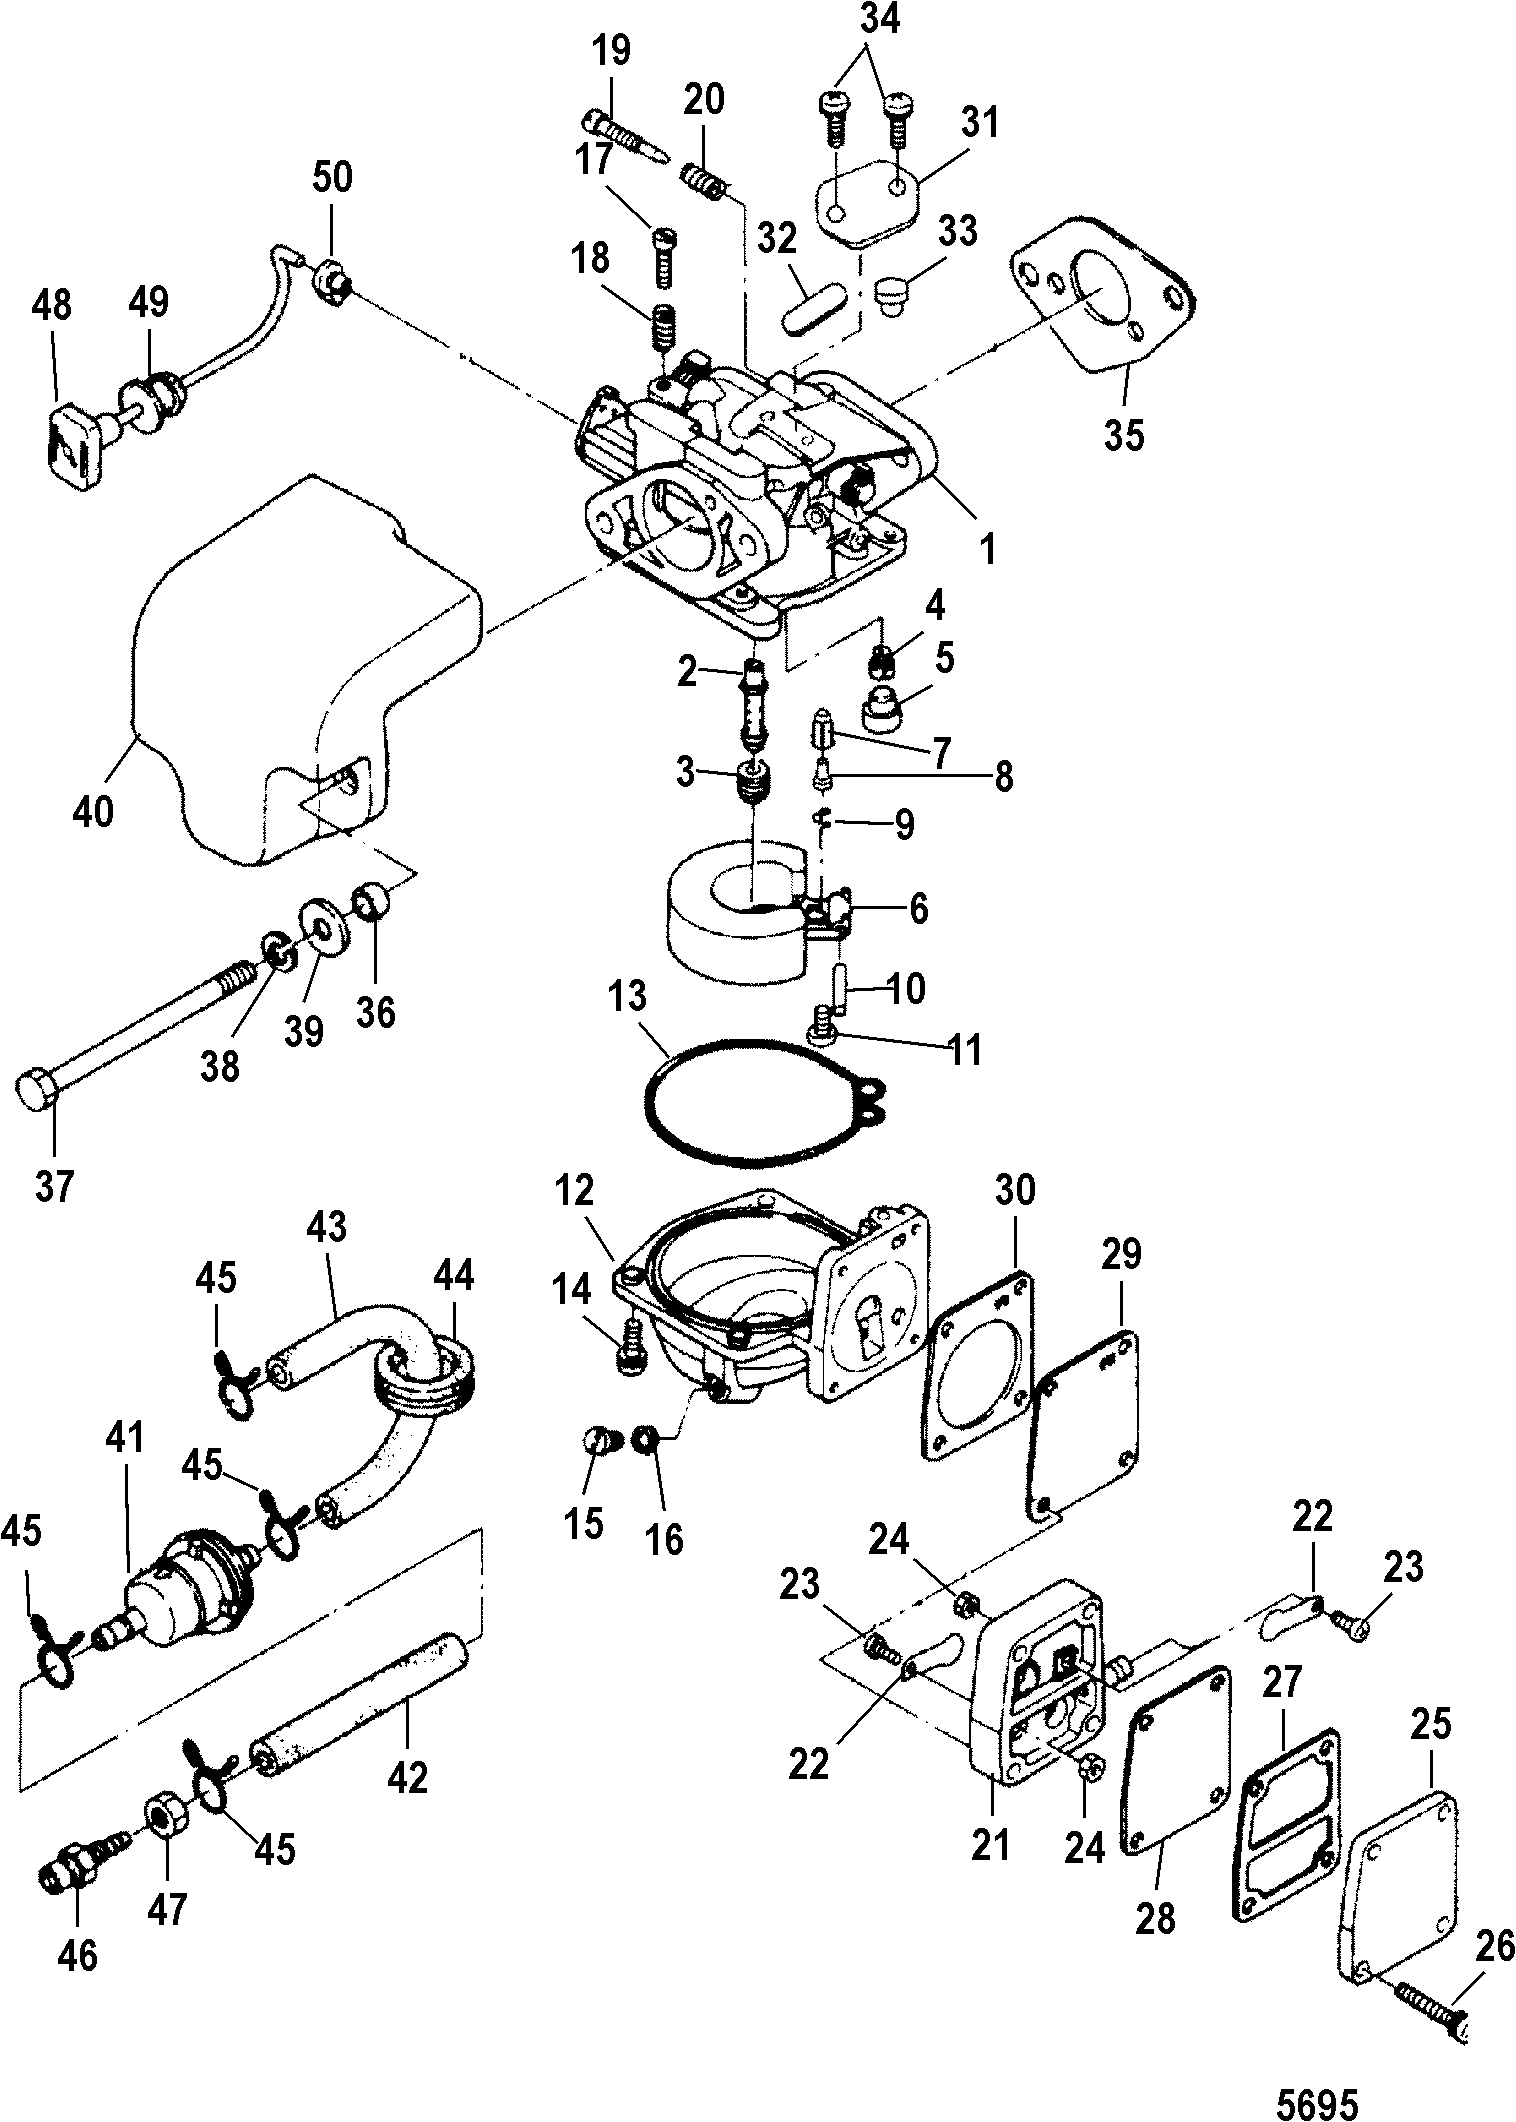 2003 25 hp mercury carburetor